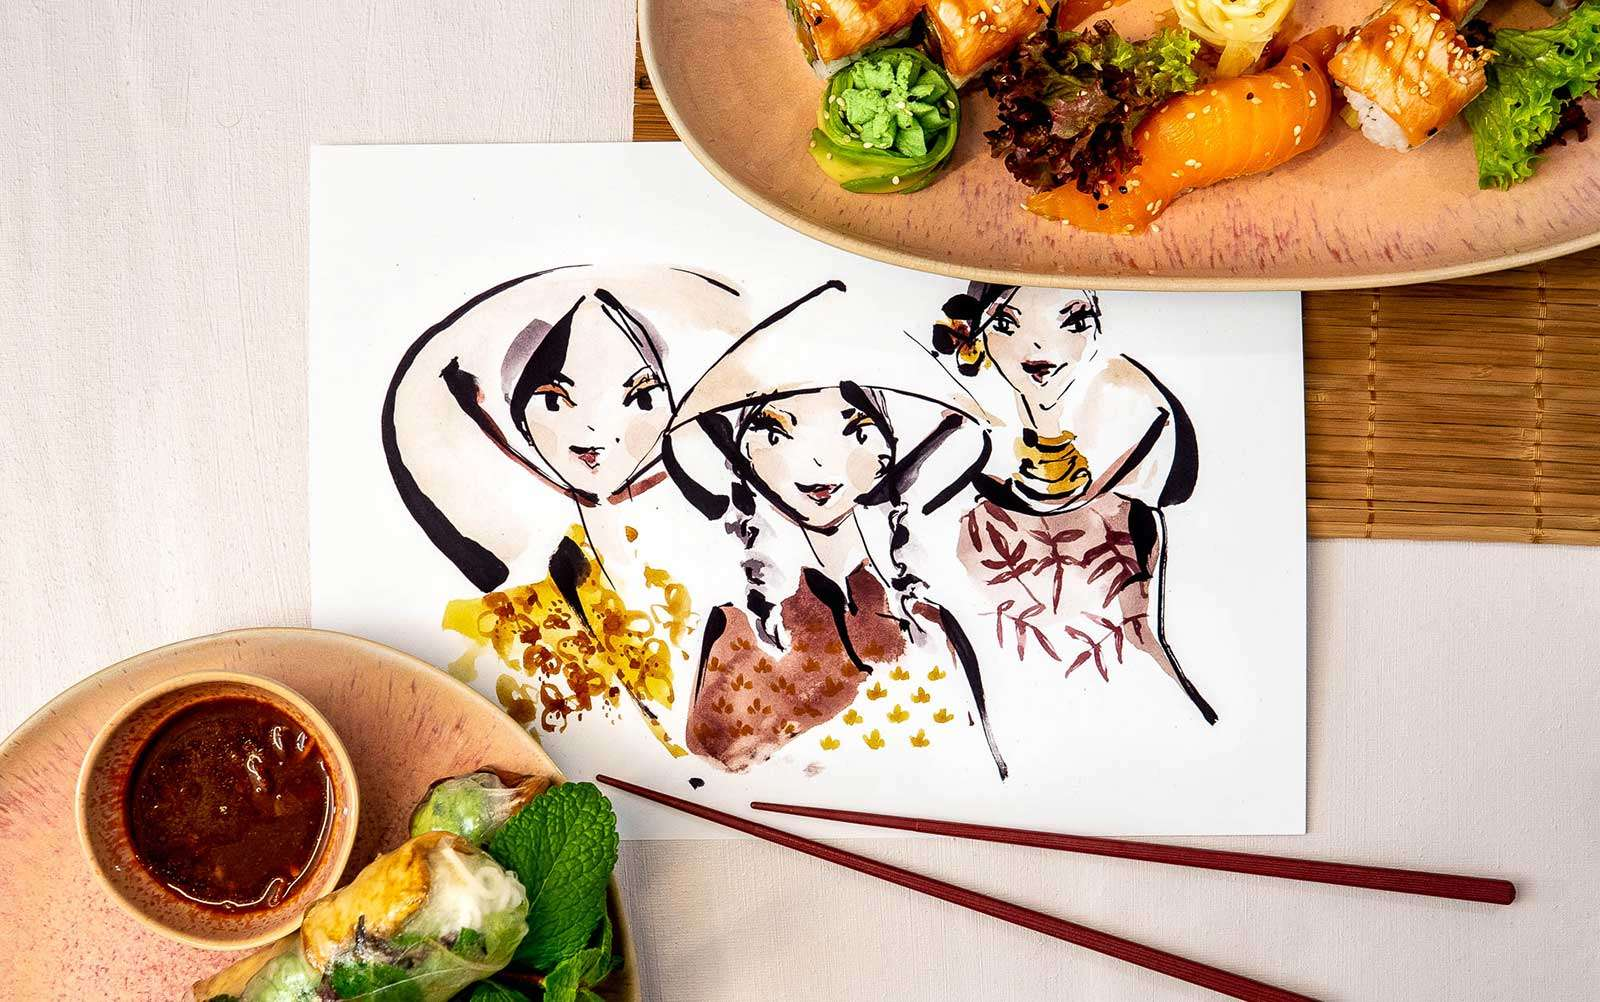 Nadja König Illustration Food Jacci Asian Kitchen München